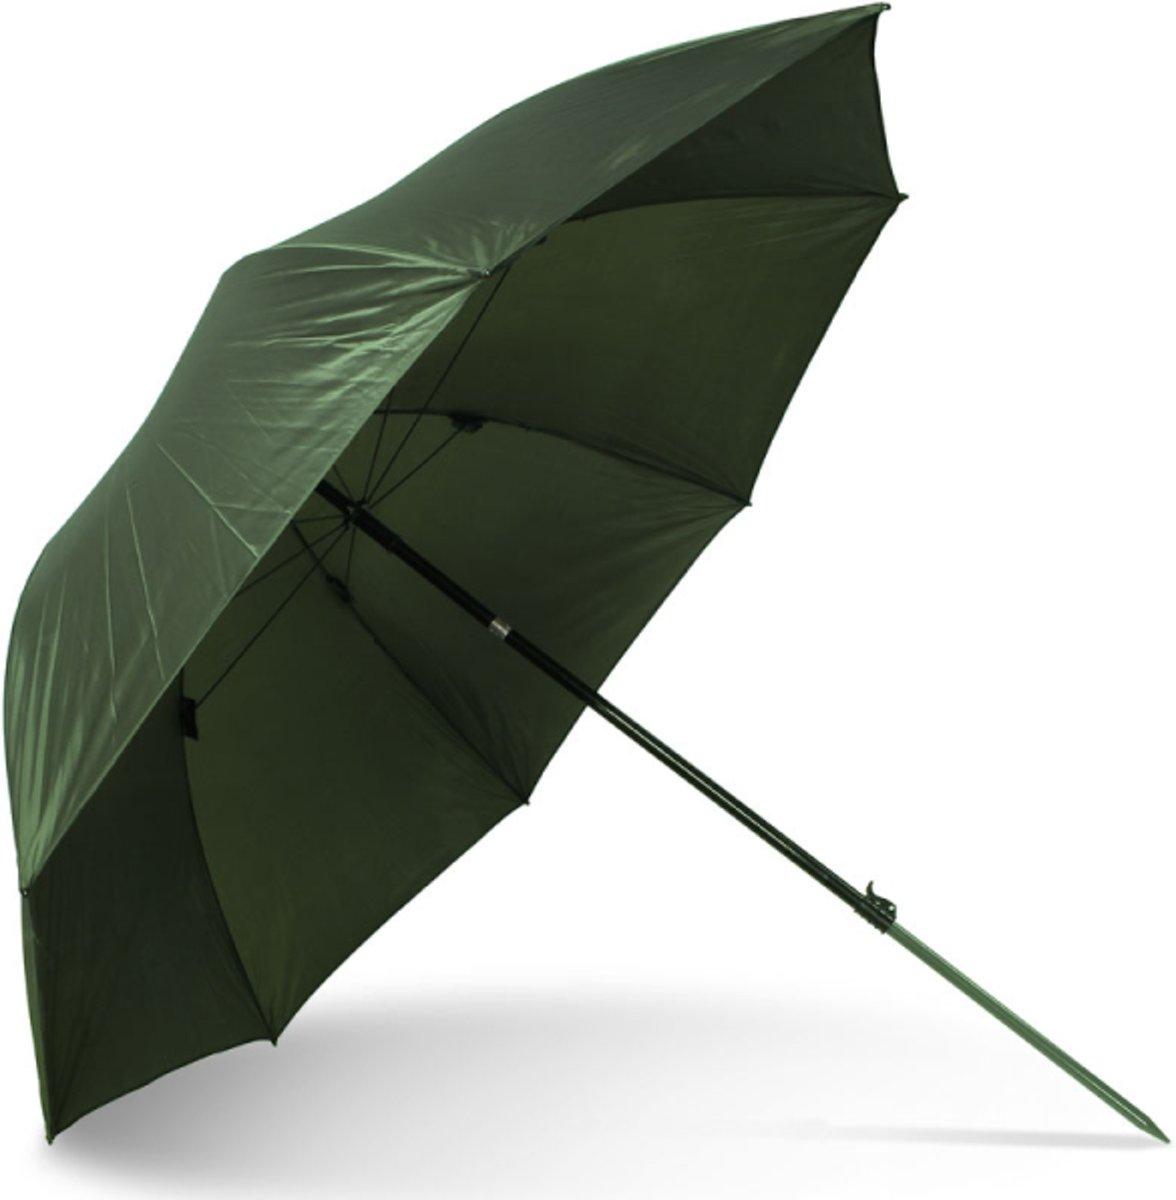 "NGT 45"" Brolly met kantelfunctie - Visparaplu - Groen"